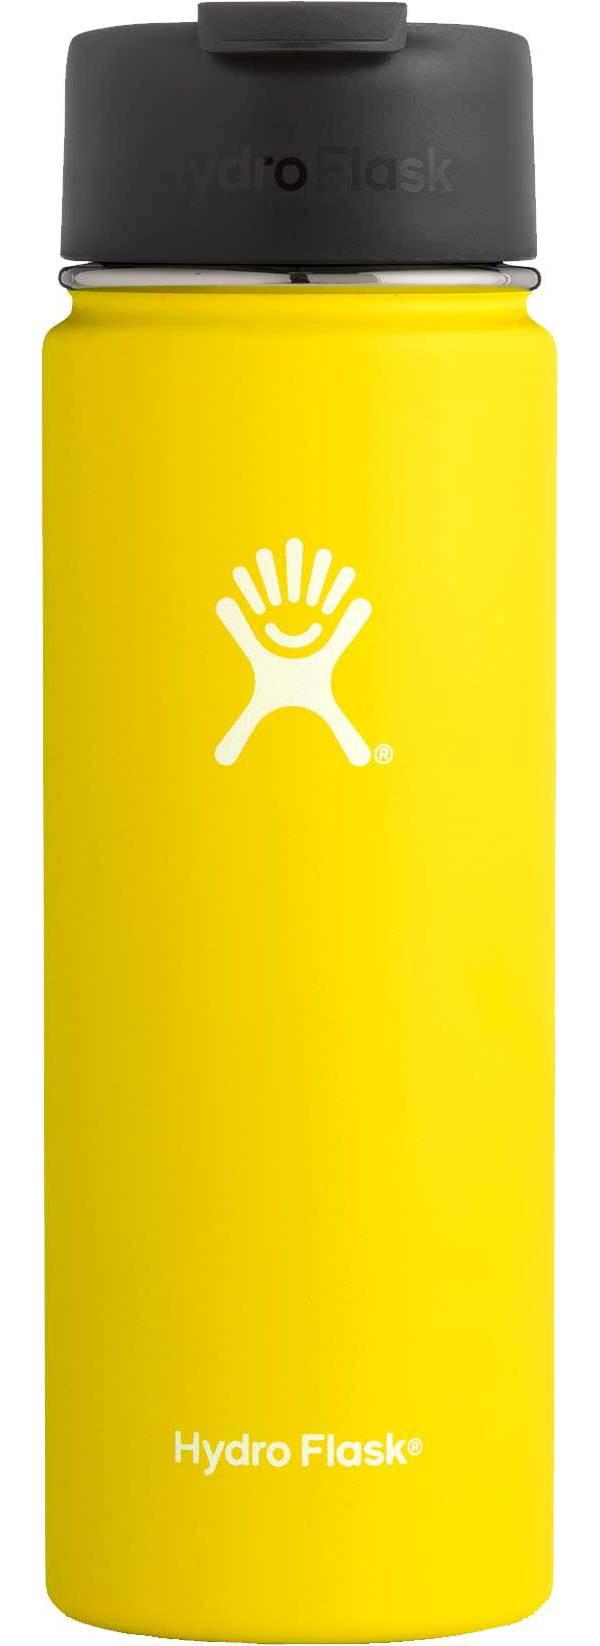 Hydro Flask Flip Top 20 oz. Bottle product image